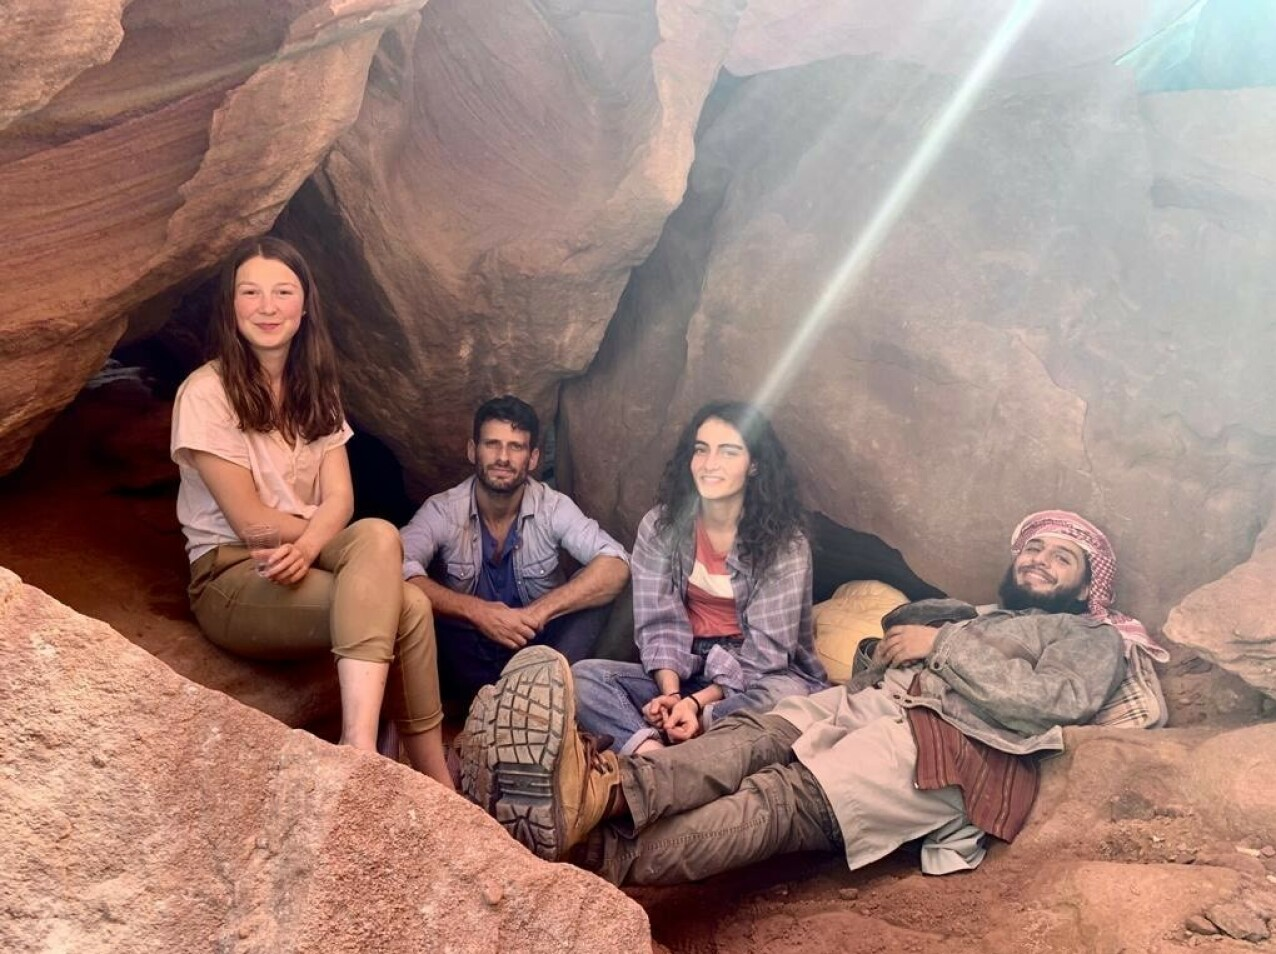 KOHORT: Andrea sammen med medskuespillerne Daniel Litman, Shira Yosef og Shadi Mar'i. FOTO: Privat